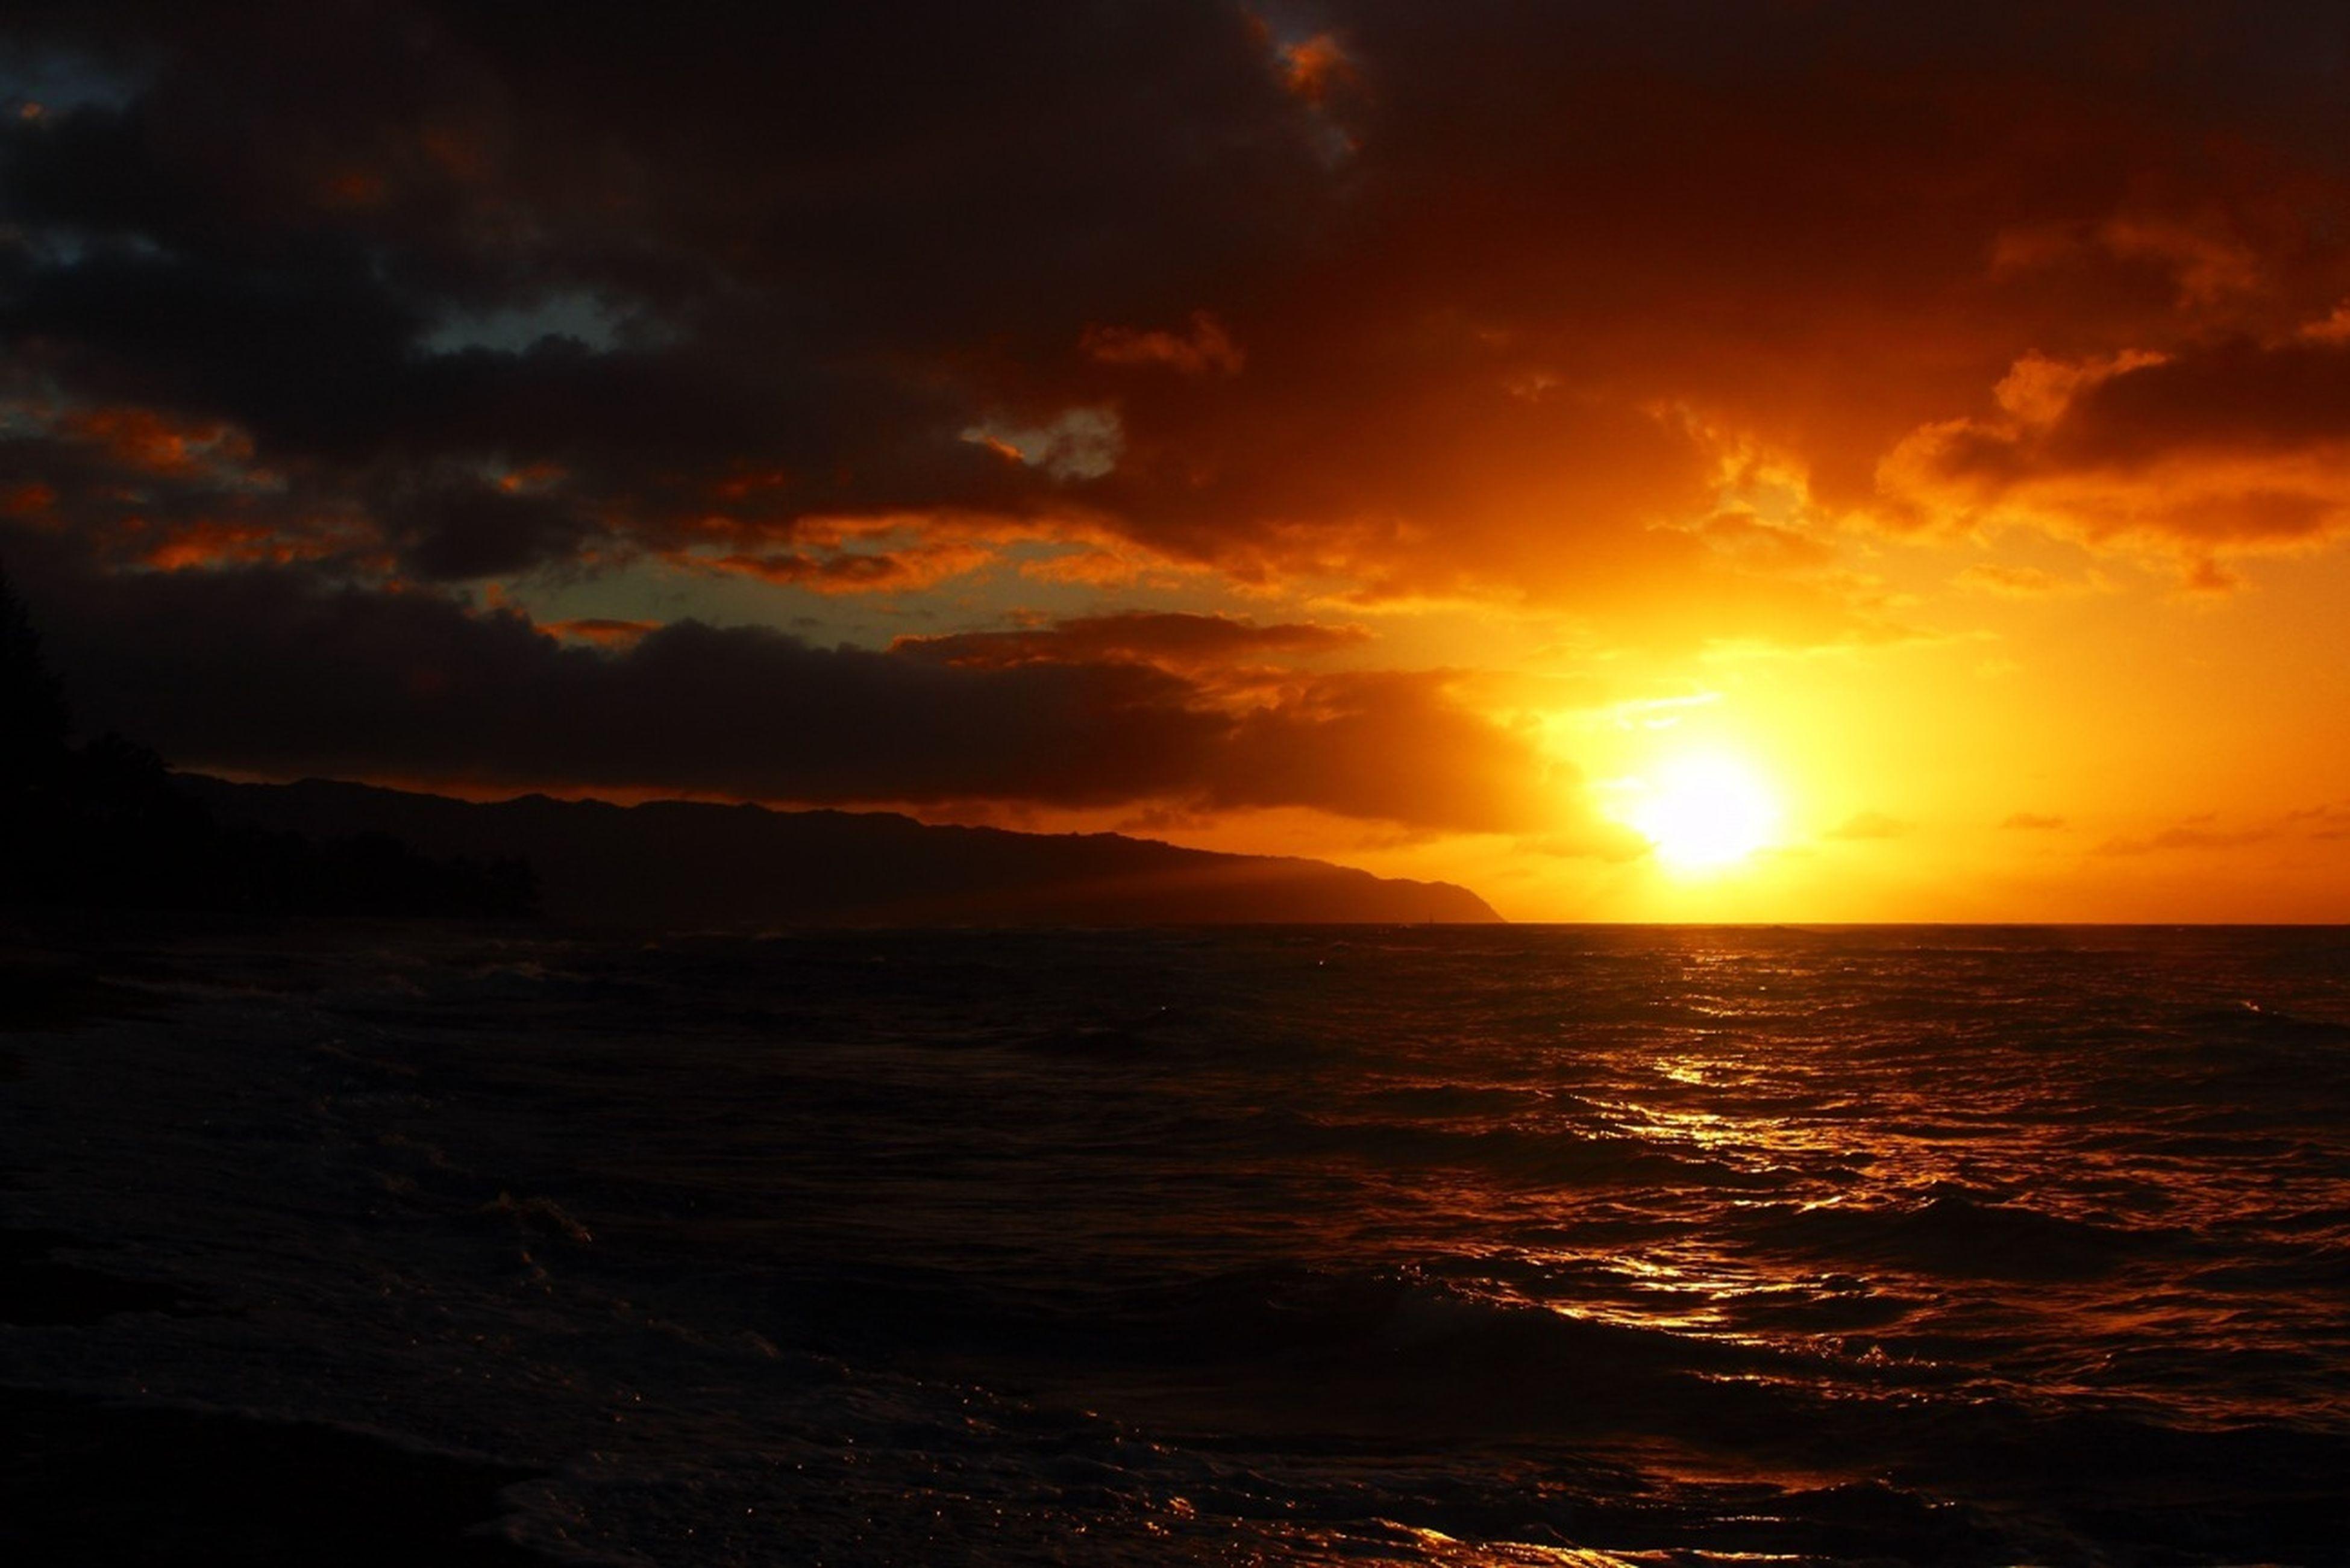 sunset, sea, water, horizon over water, scenics, beauty in nature, tranquil scene, orange color, sky, tranquility, sun, idyllic, cloud - sky, nature, reflection, cloud, beach, seascape, dramatic sky, sunlight